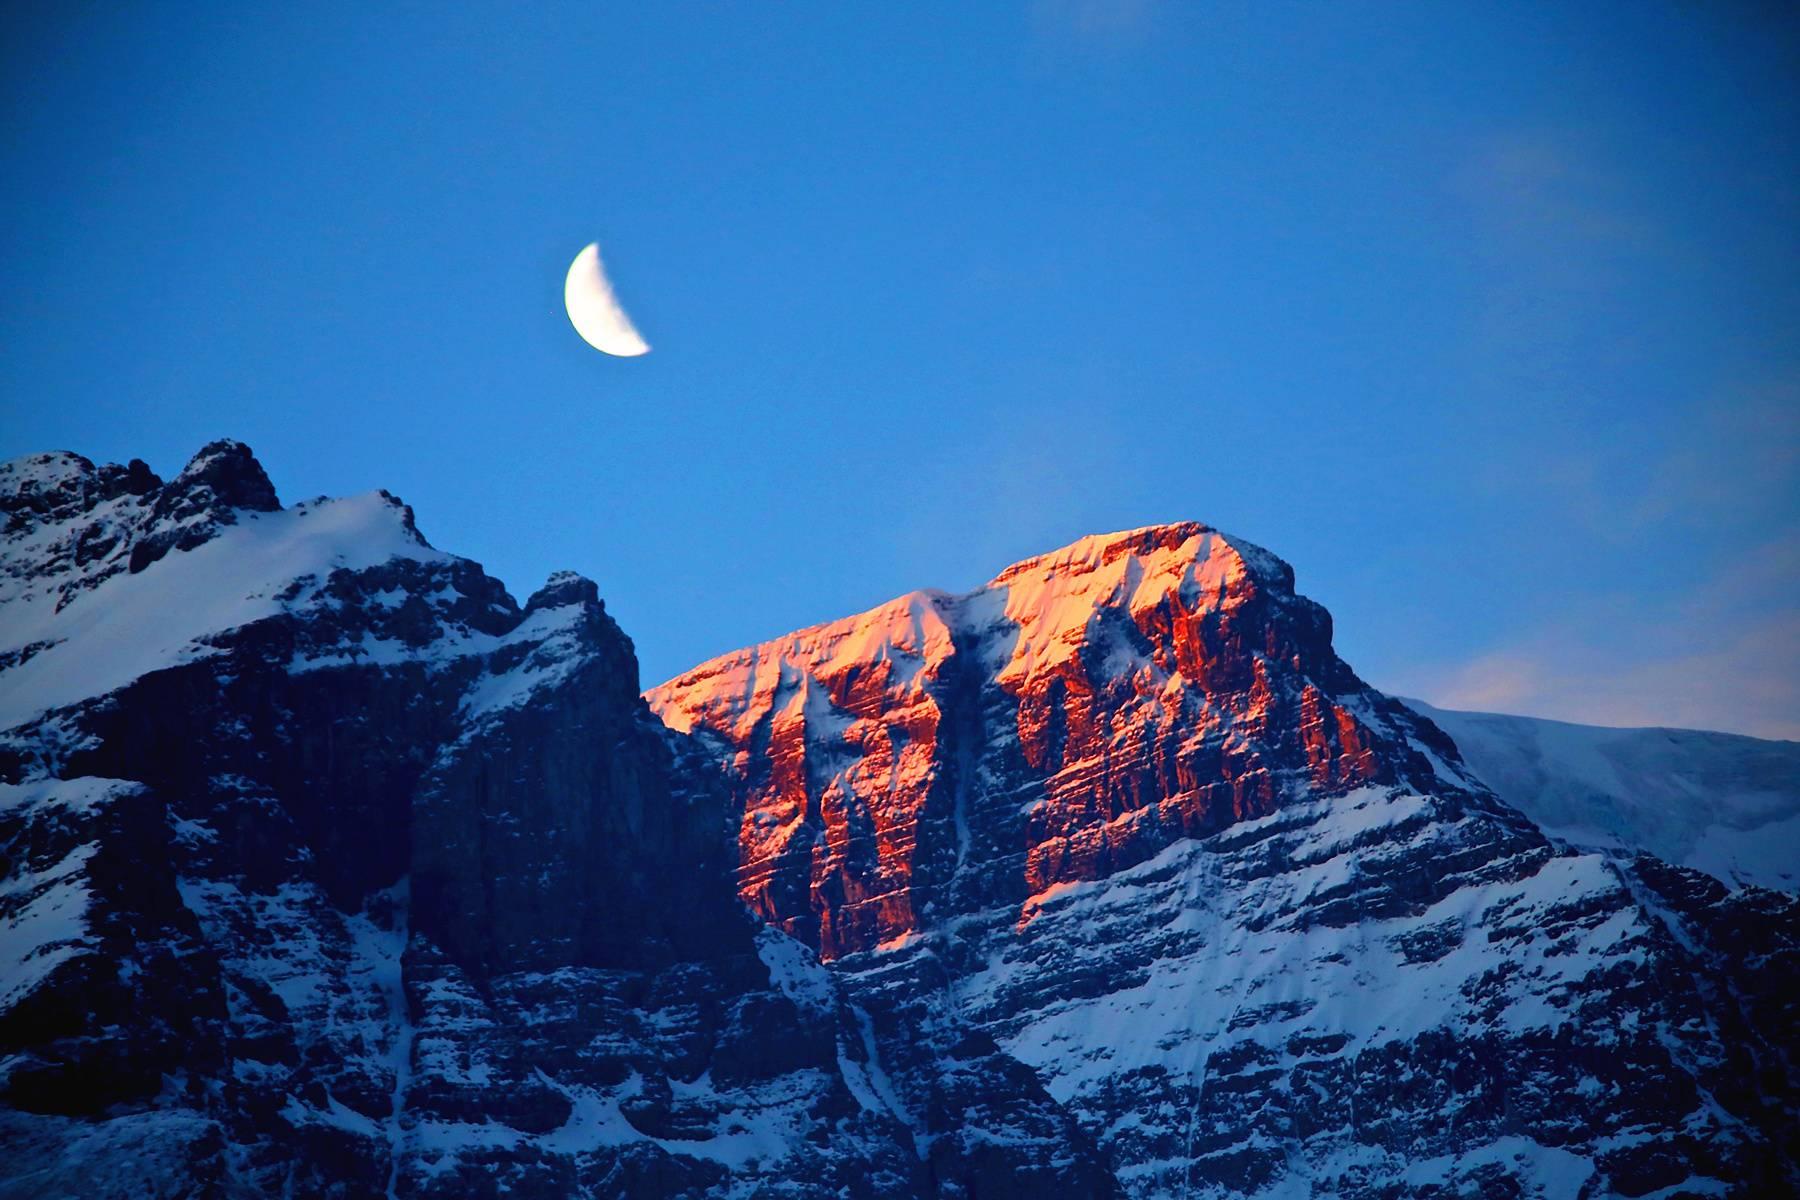 7-Day Canadian Rockies Tour From Calgary W/ Kootenary National Park